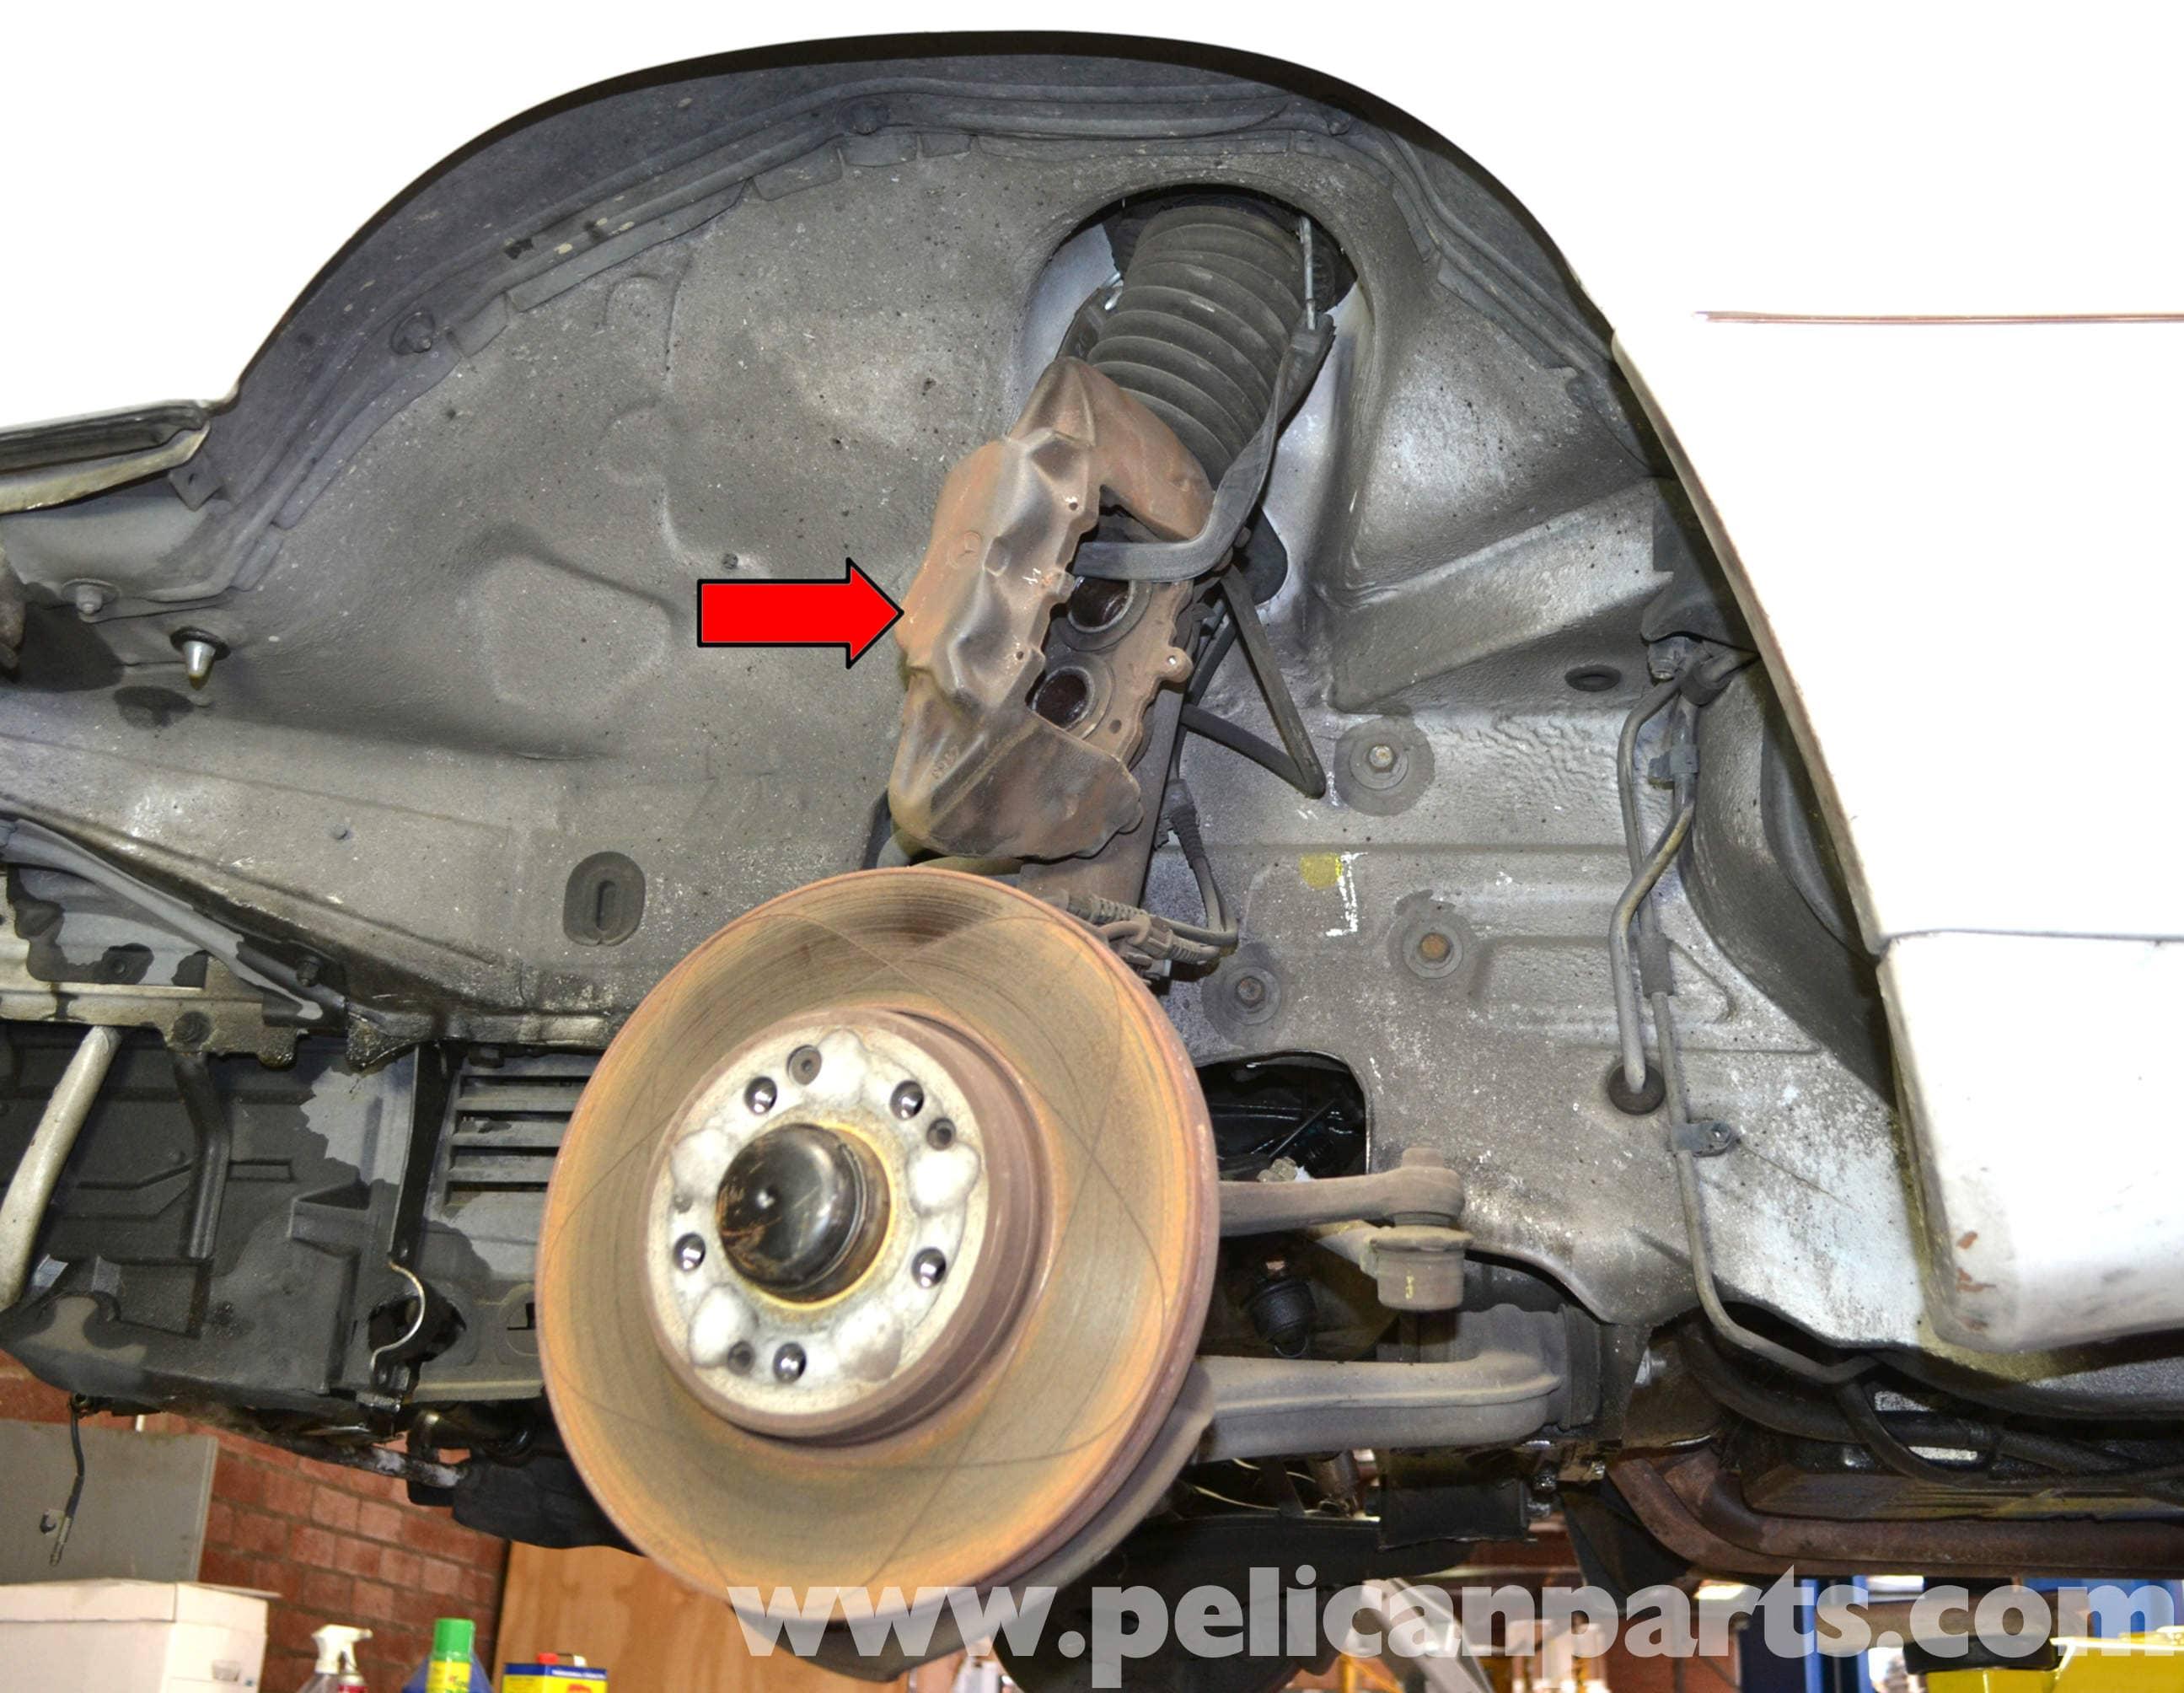 Mercedes Benz W124 Front Brake Caliper Replacement 1986